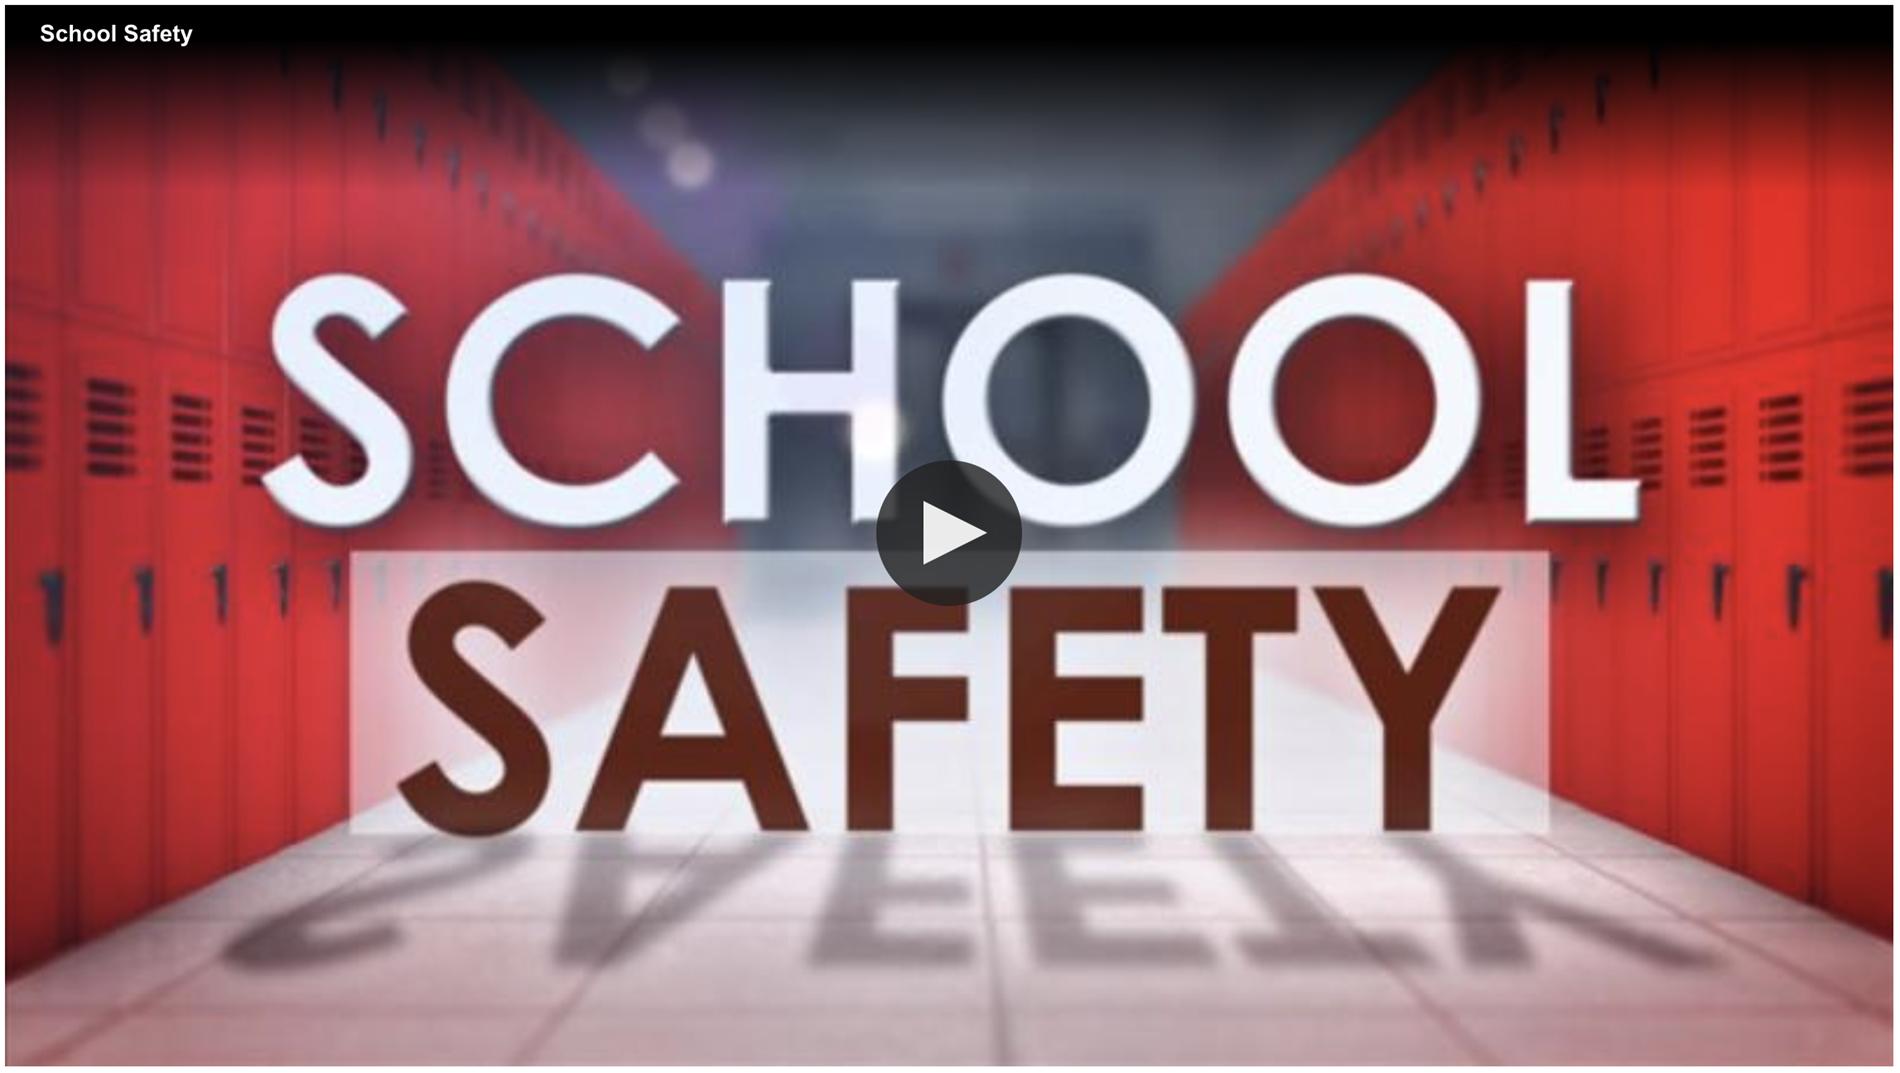 School Safety video